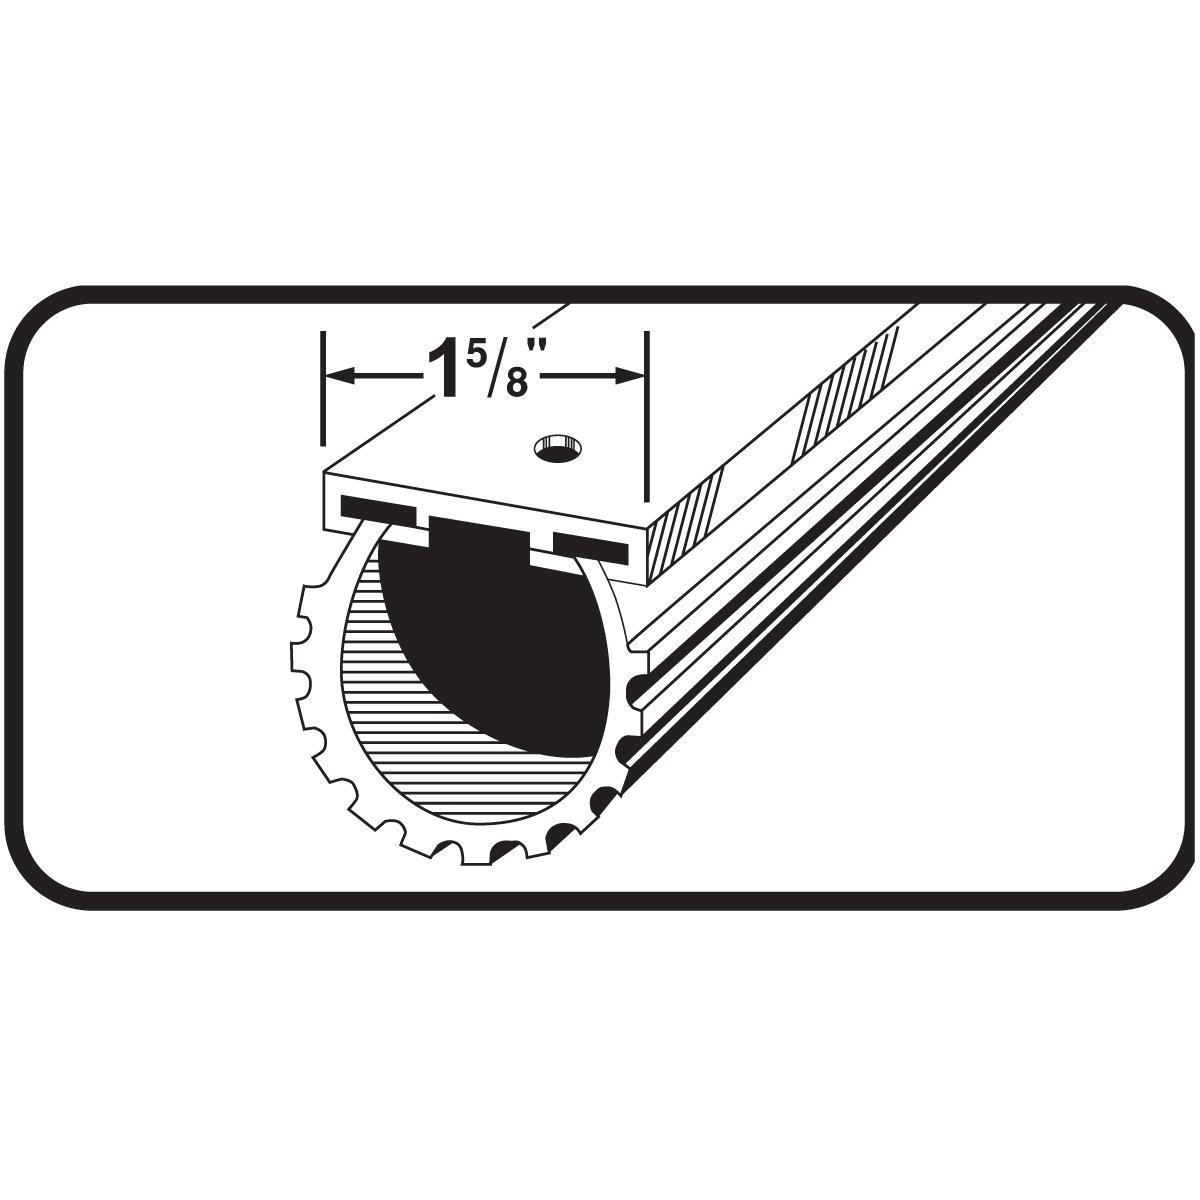 Black M-D Building Products 87643 9-Feet Universal Aluminum and Rubber Garage Door Bottom